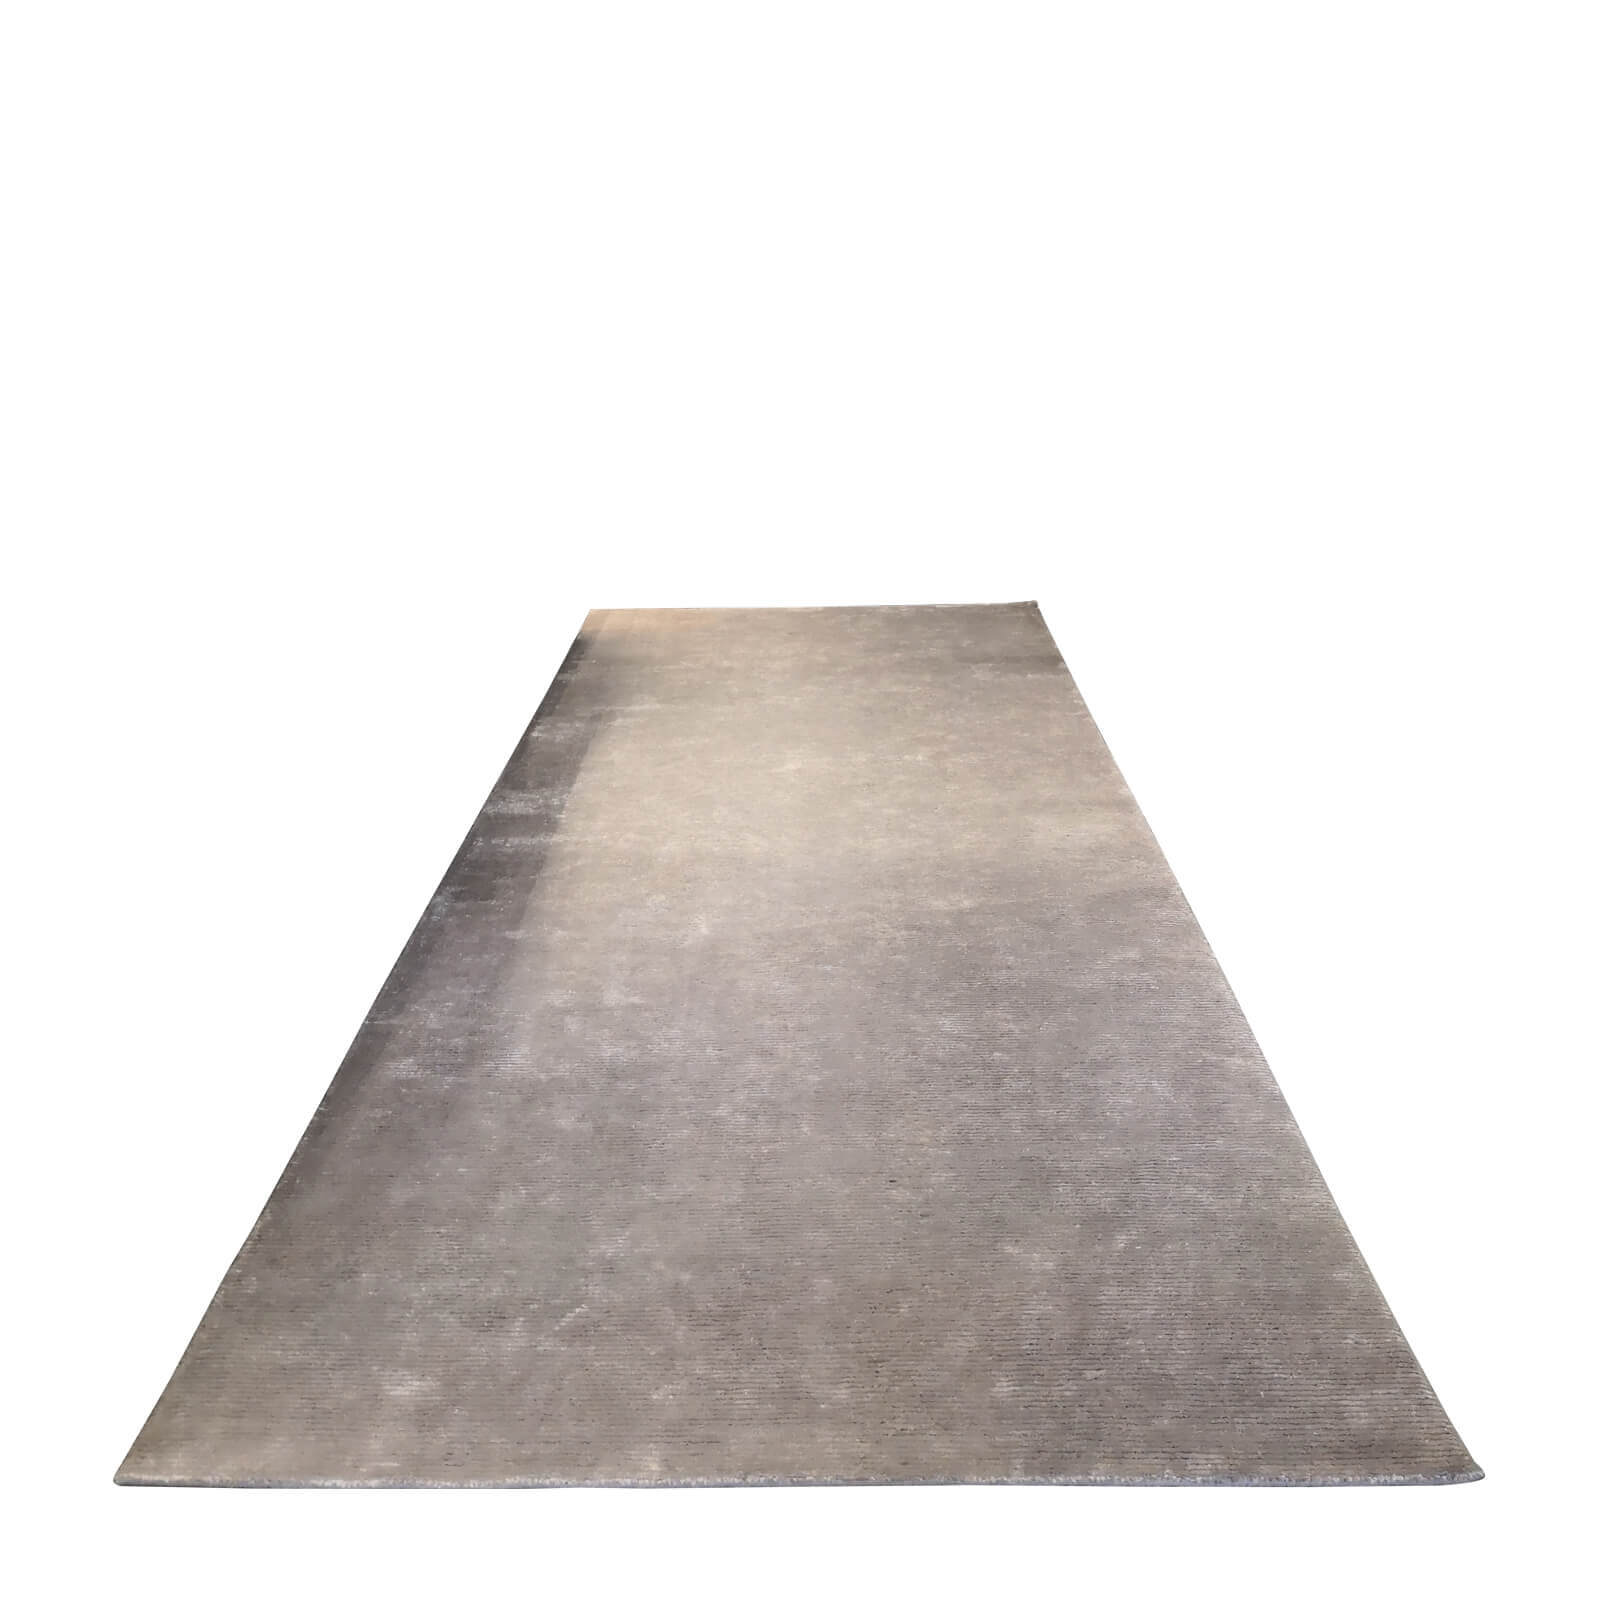 Bayliss Jewel wool rug in metal grey